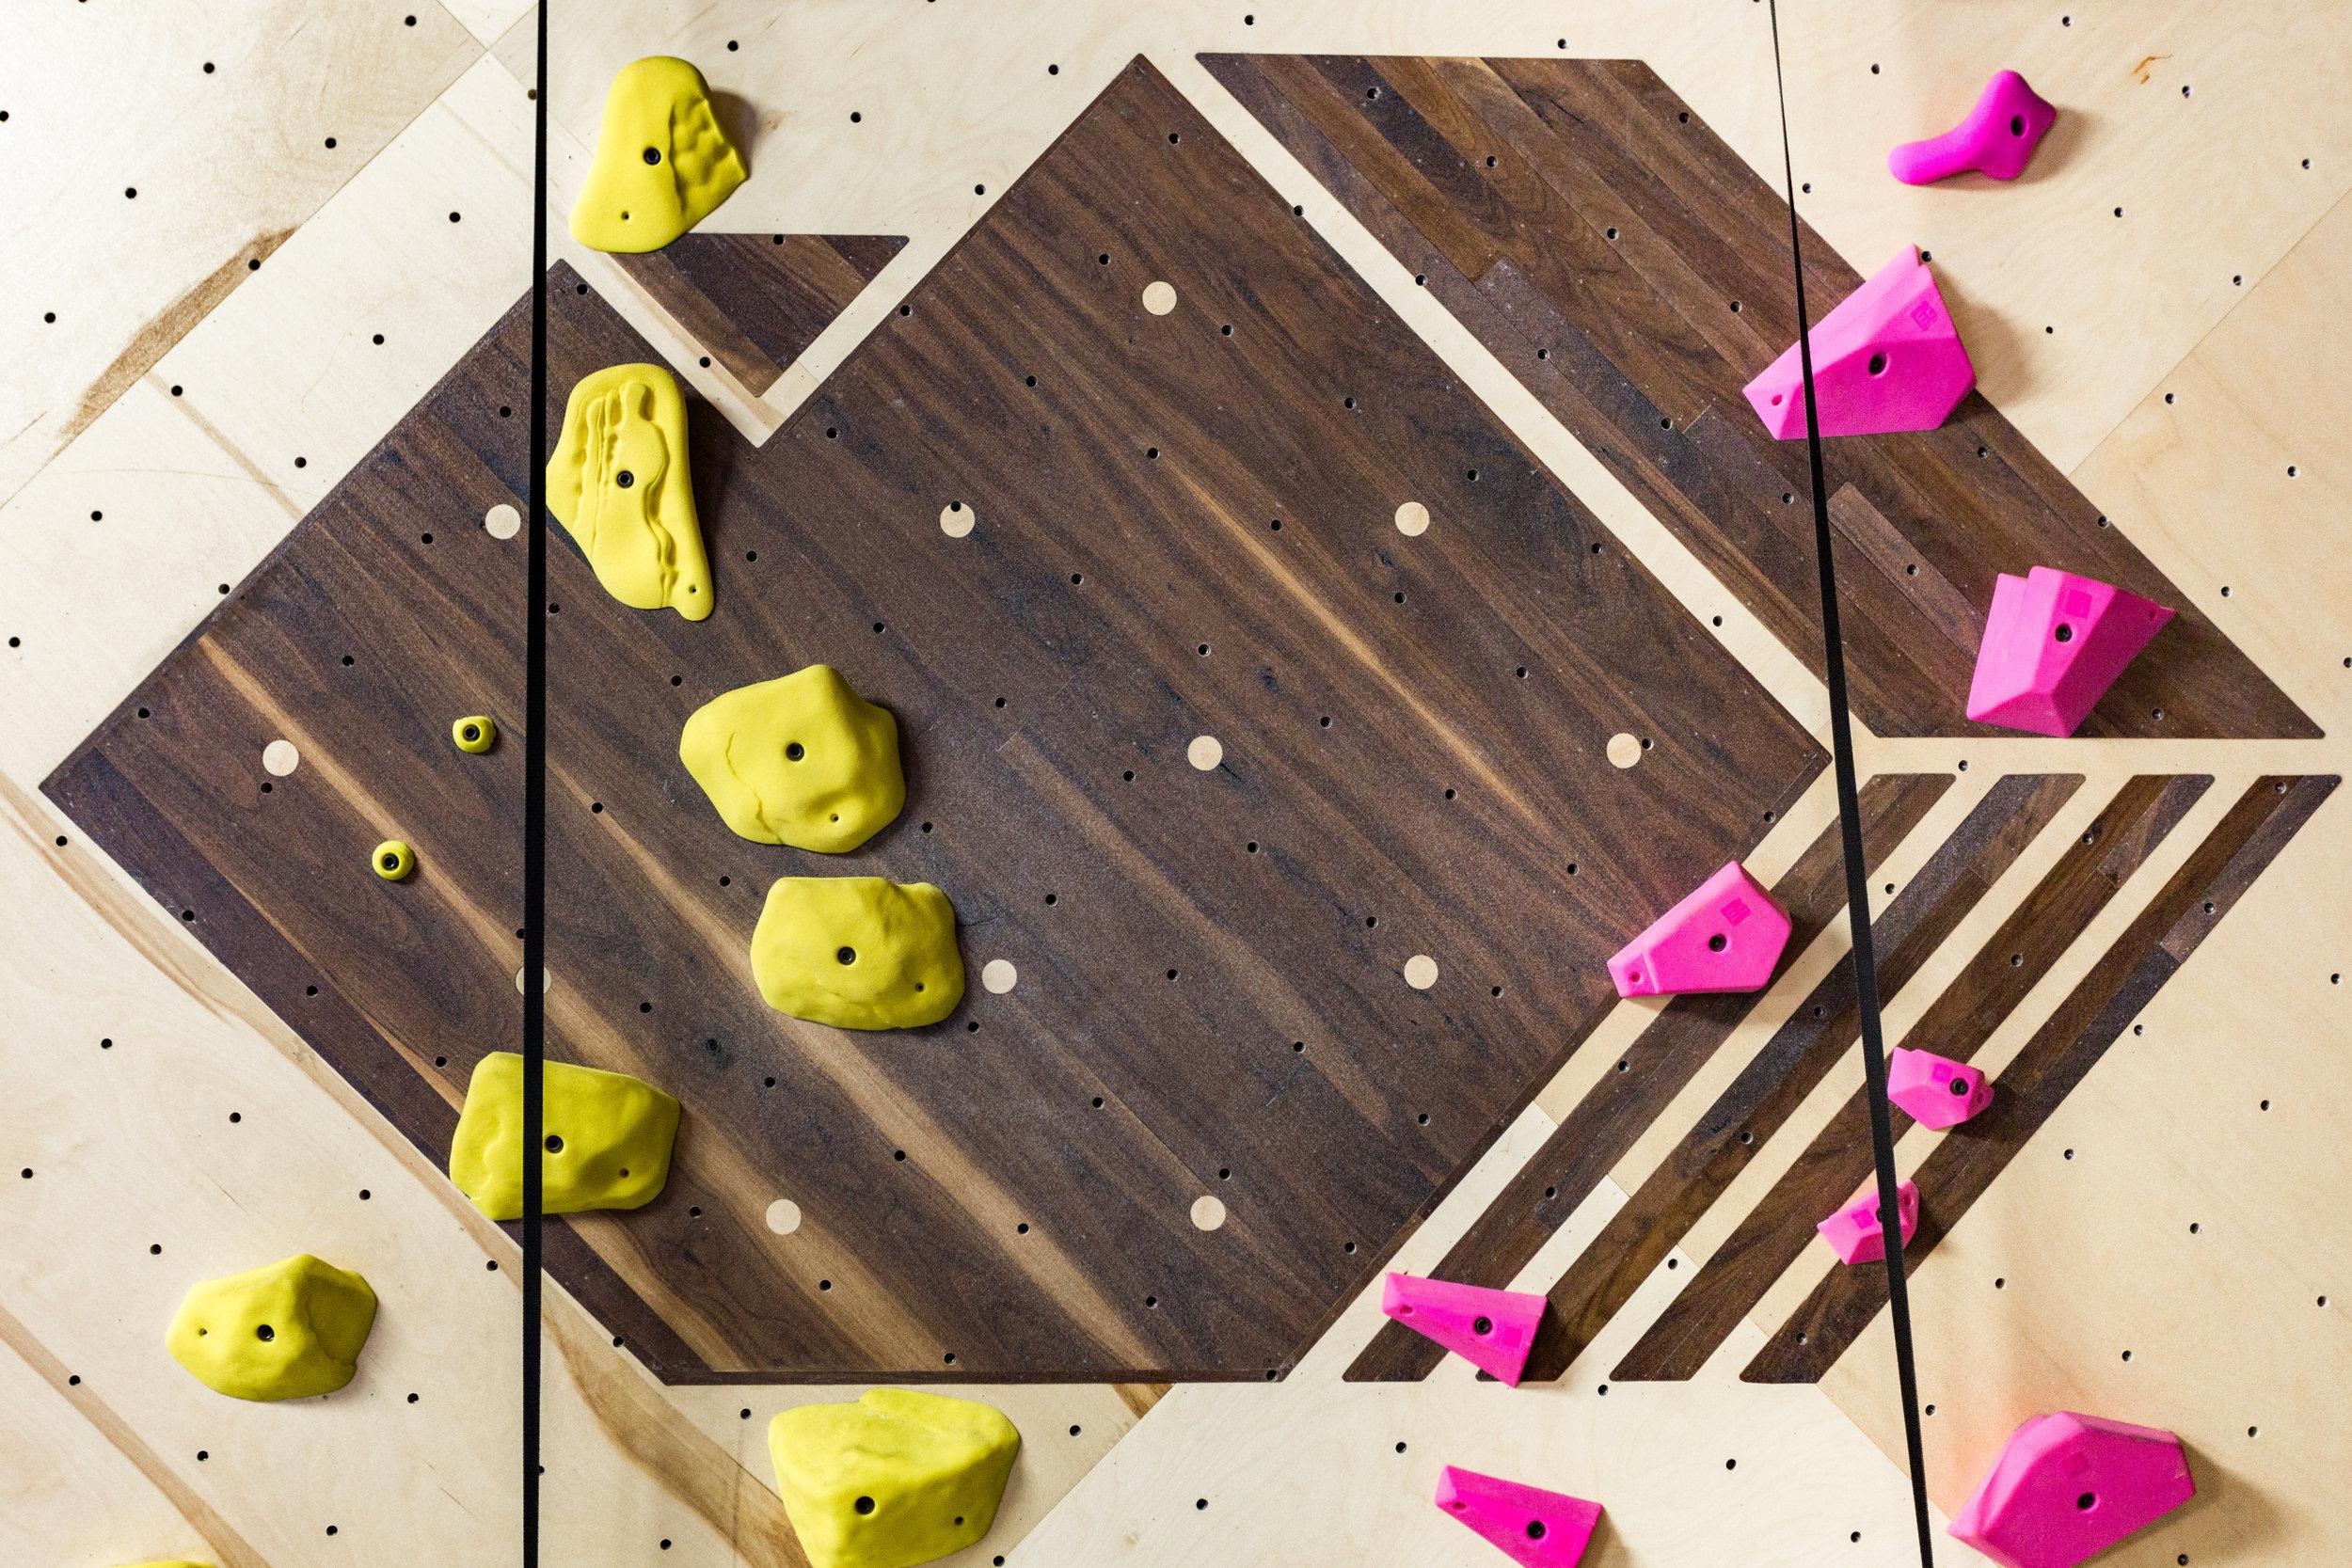 emily-sierra-wooden-mountain-21.jpg